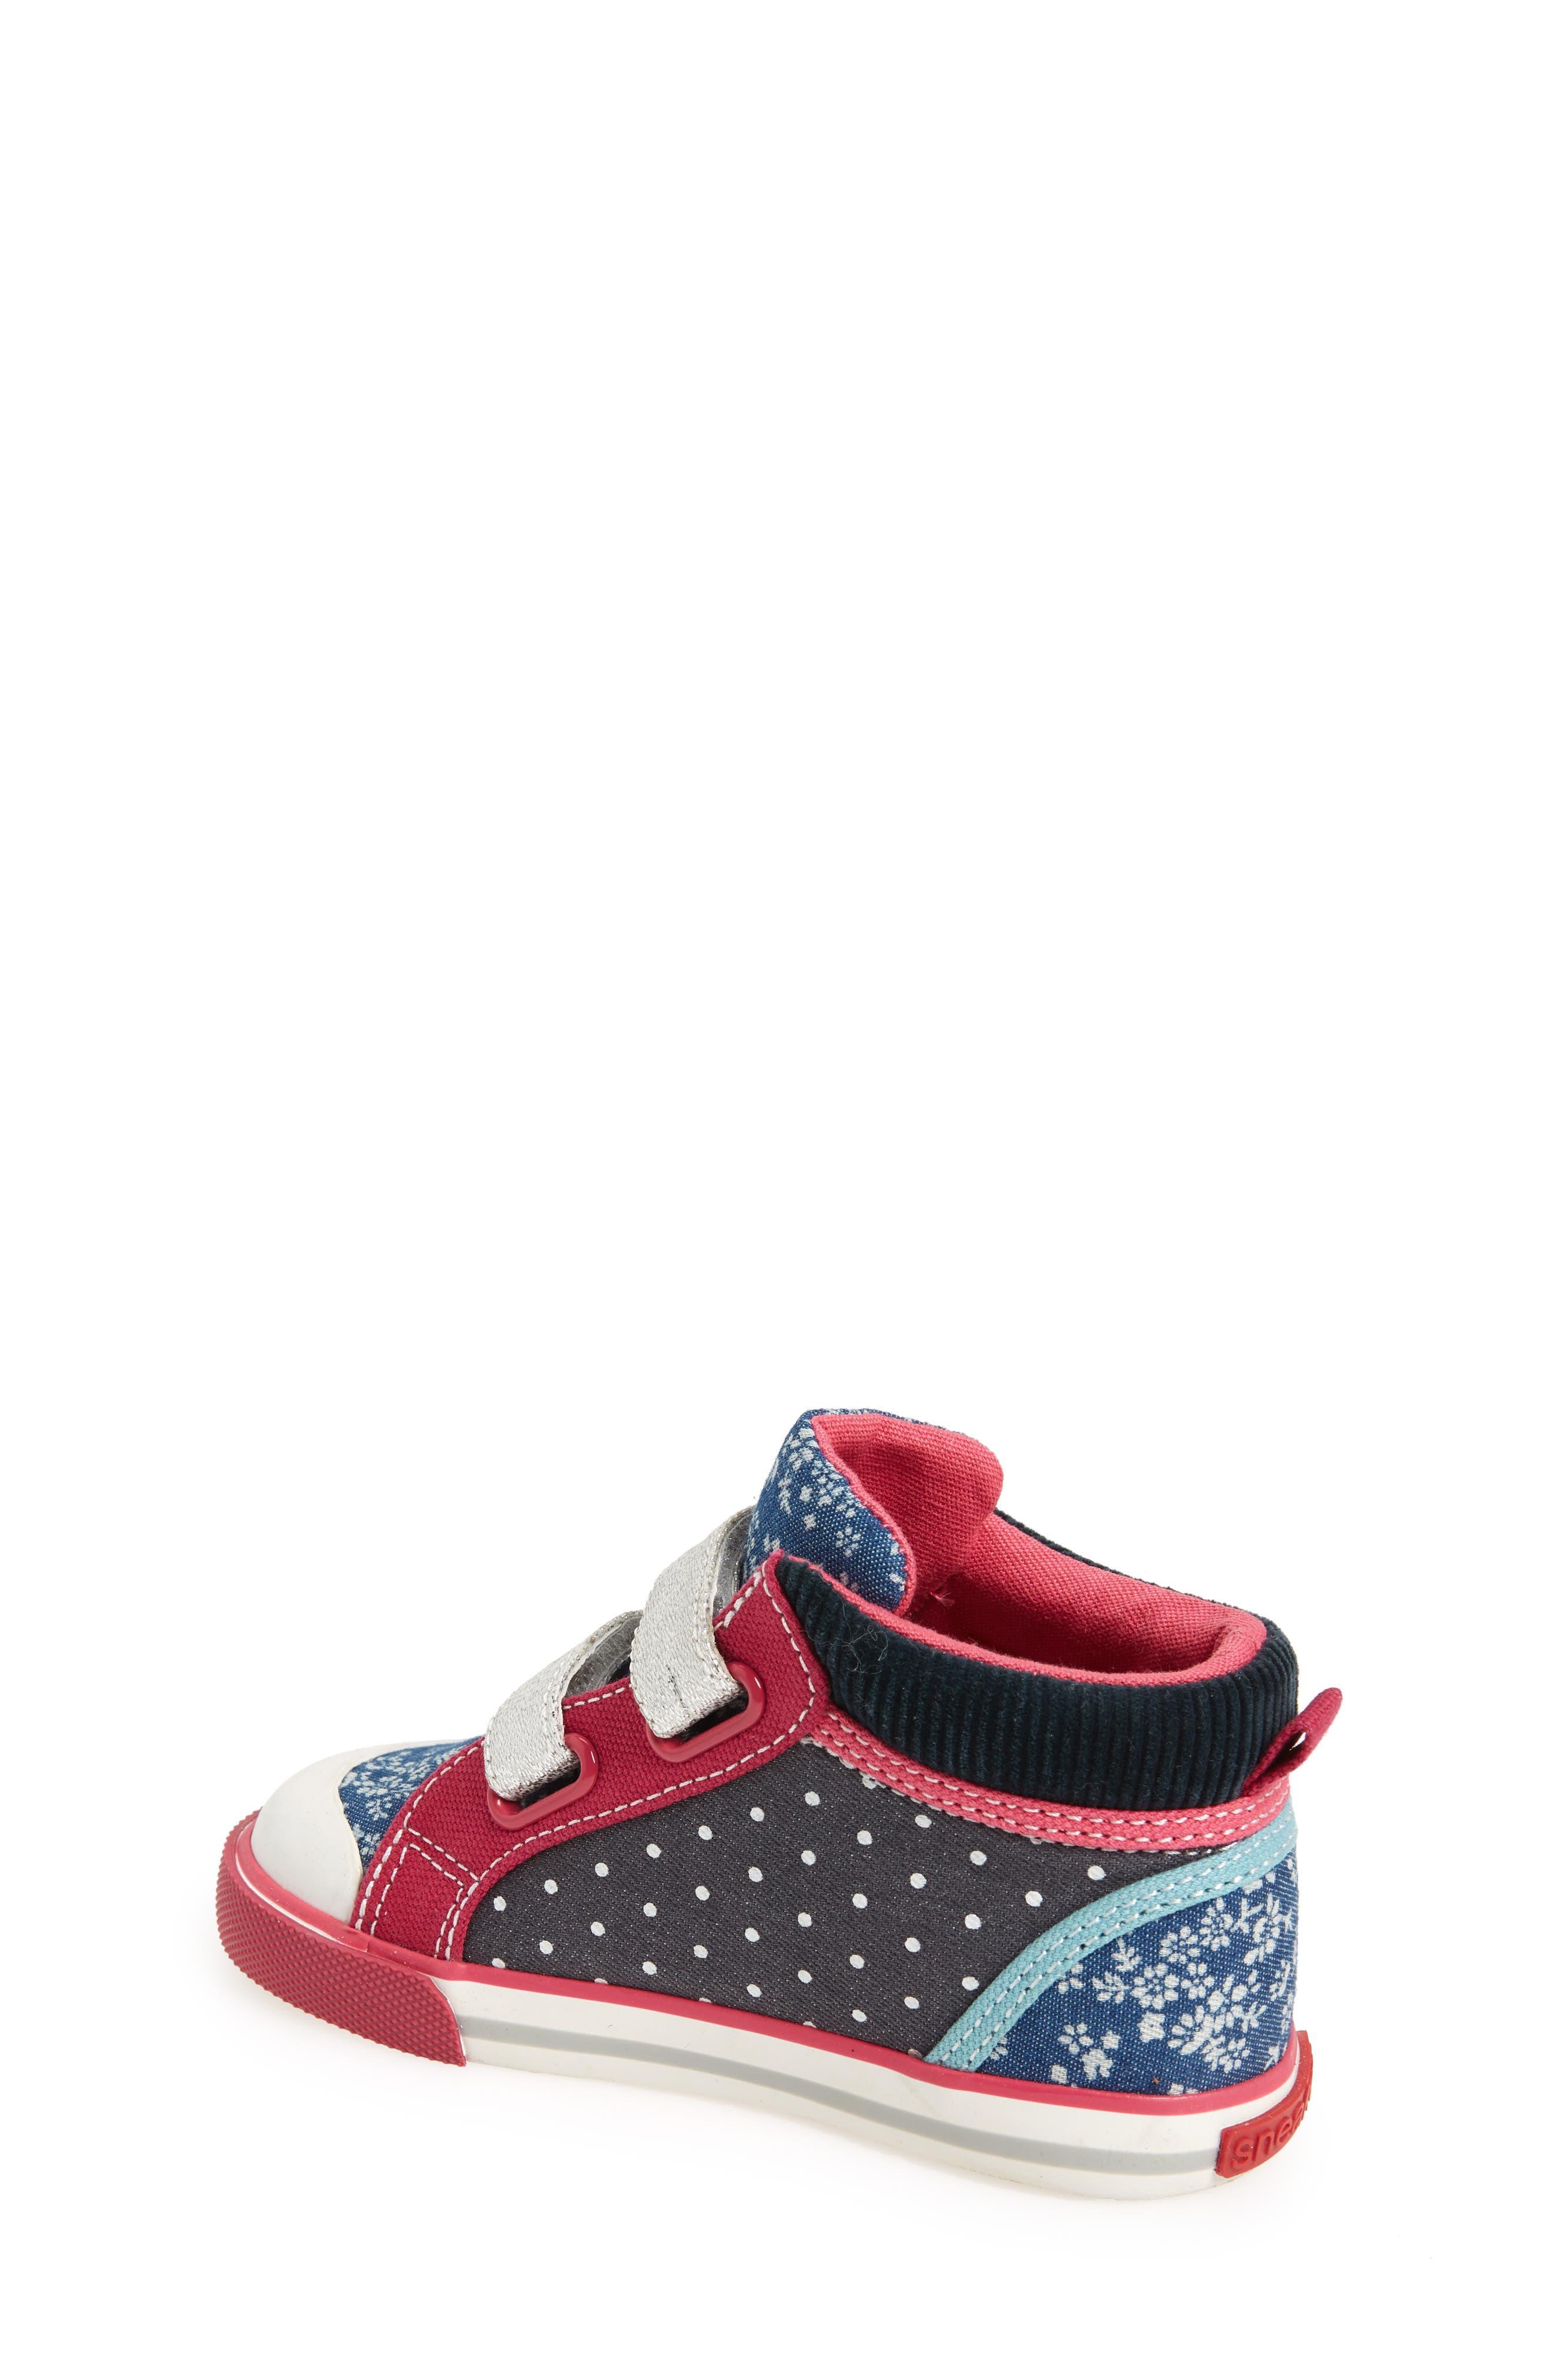 Kya Sneaker,                             Alternate thumbnail 2, color,                             Navy Corduroy/ Multi